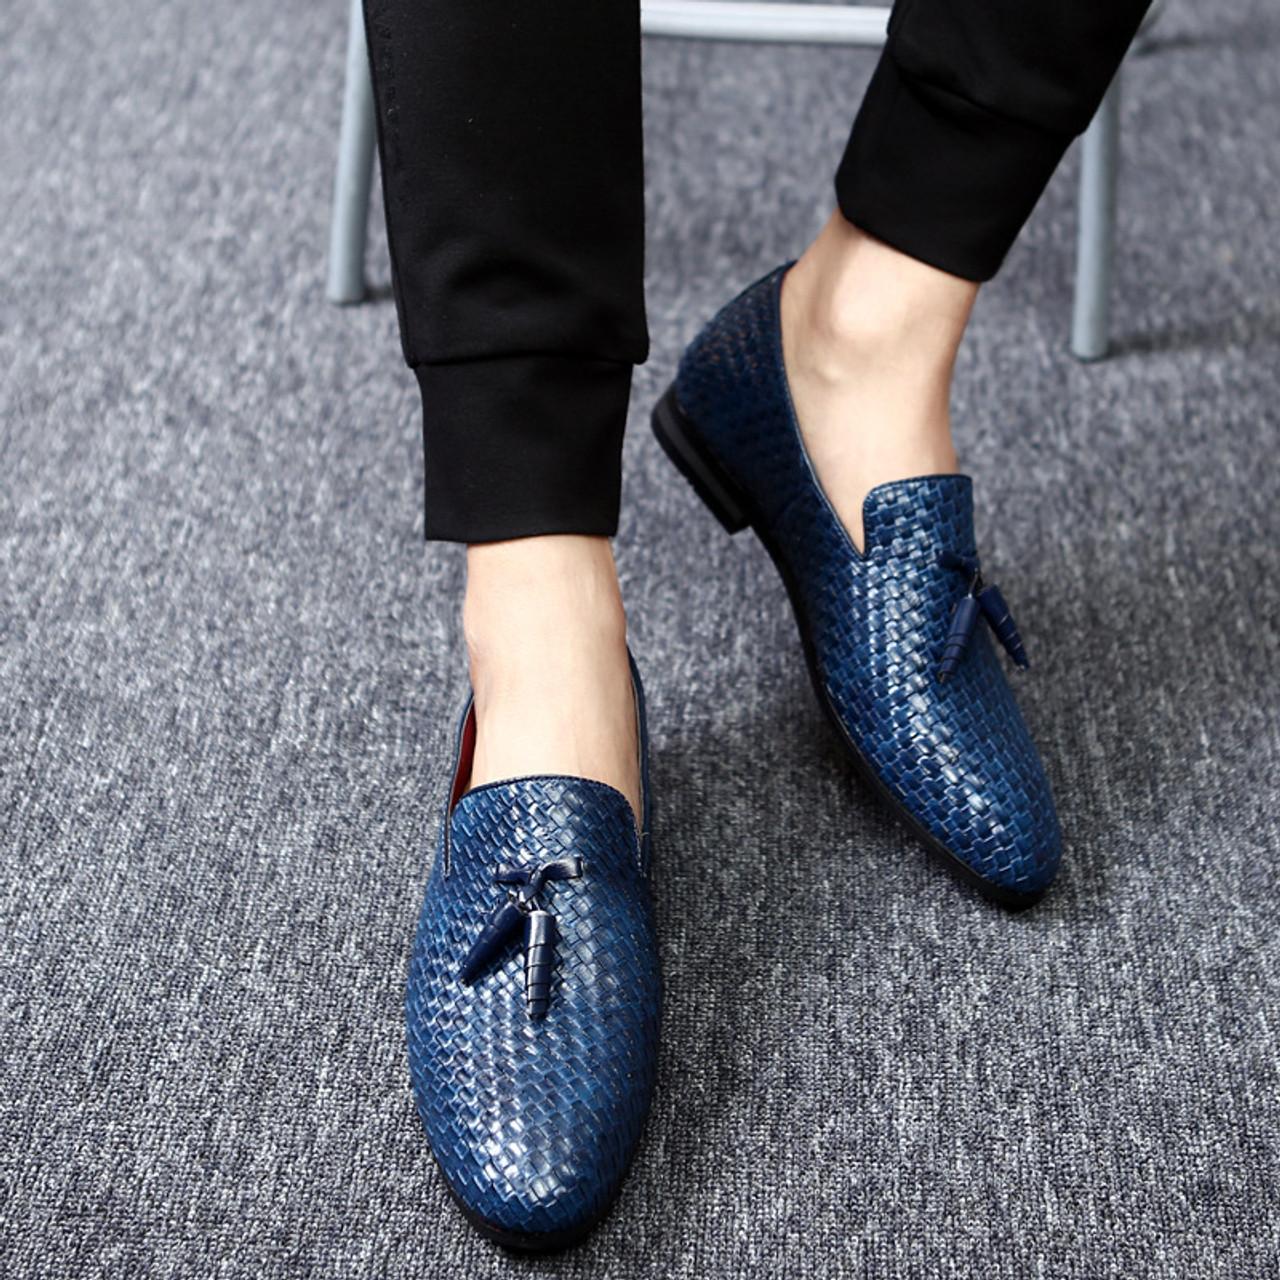 Npezkgc Men Shoes Luxury Brand Classic Fashion Formal Wedding Dress Shoes For Men Oxfords Zapatos Hombre Weaving Leather Shoes Formal Shoes